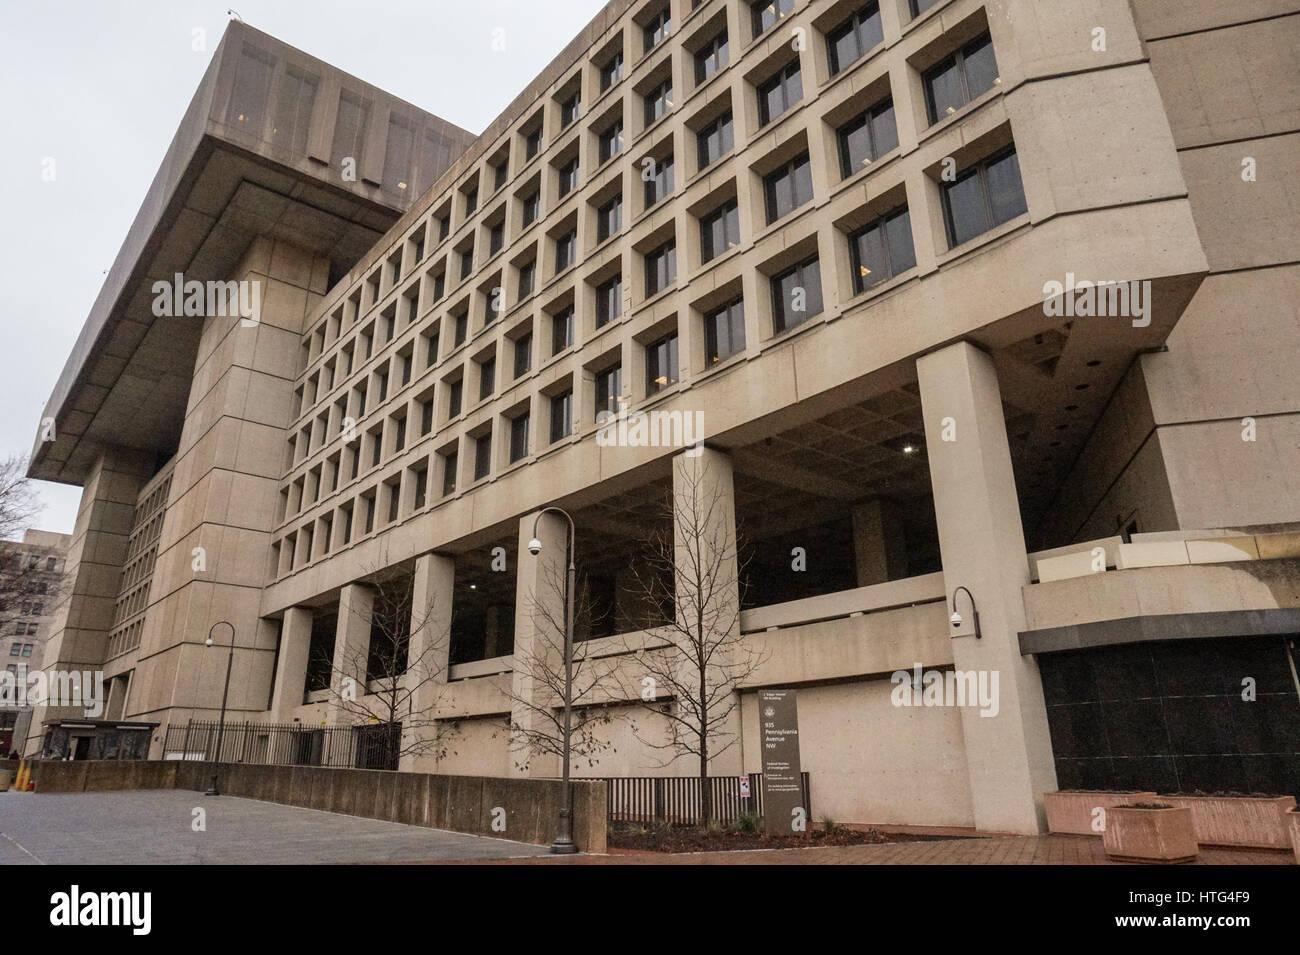 Das hauptquartier der federal bureau der investigation fbi im j